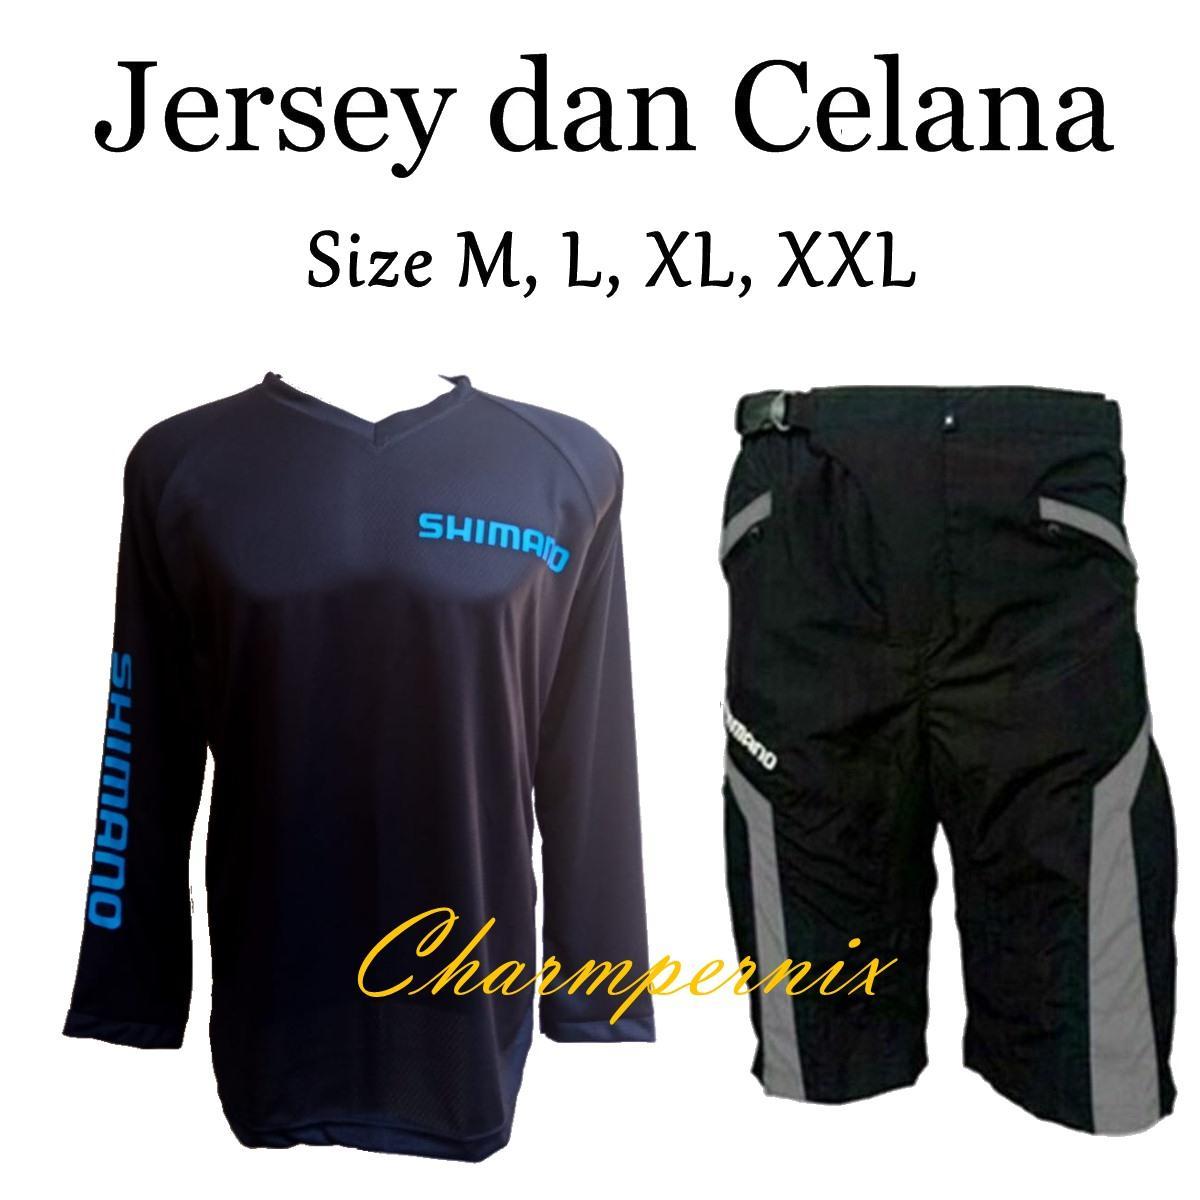 ... Celana Limited EditionIDR180000. Rp 180.000